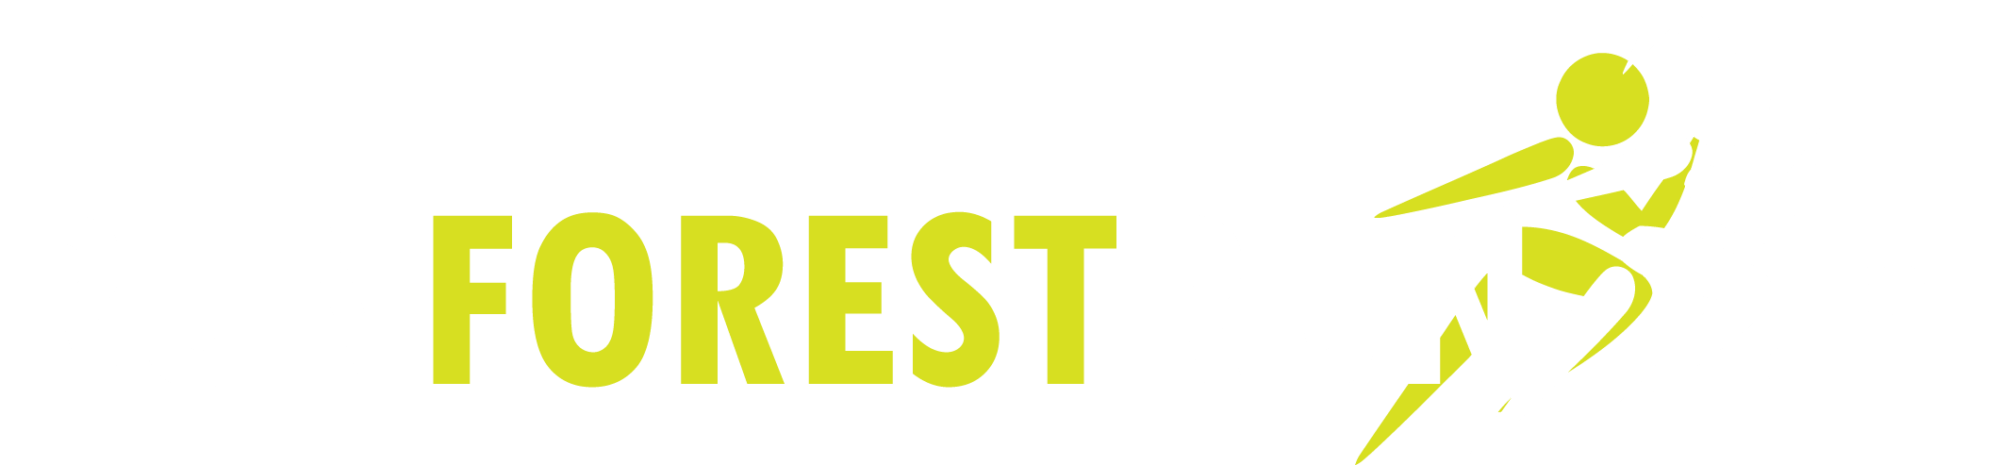 Logo RunForestRun